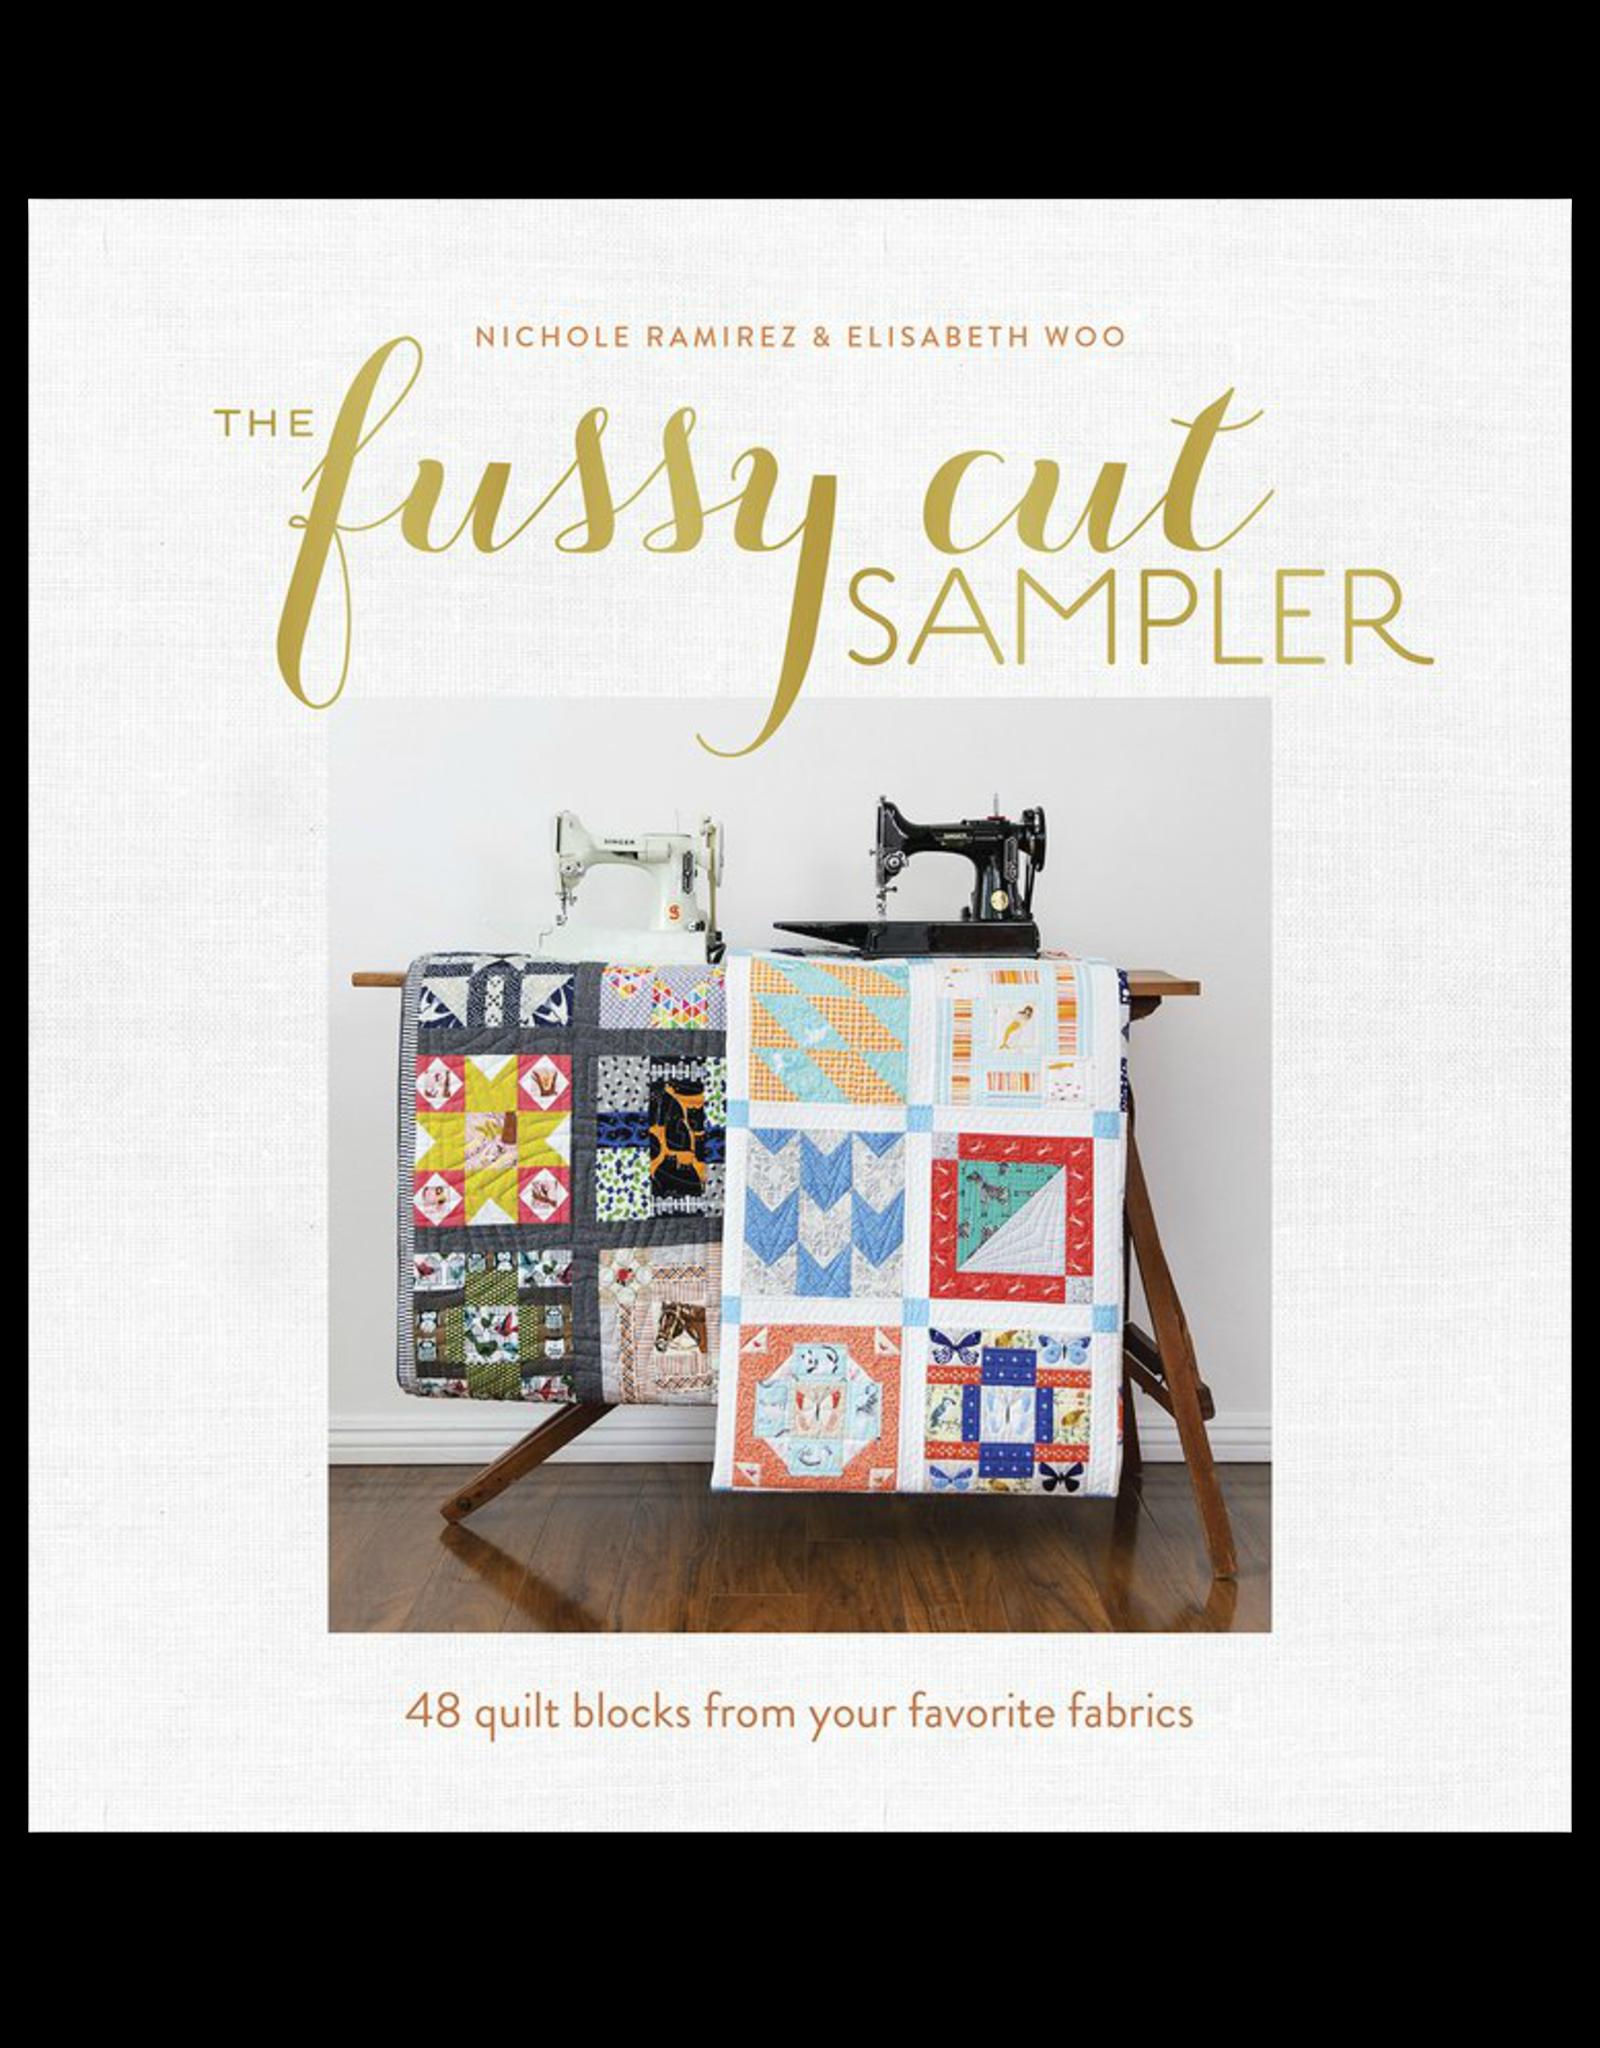 Nicole Ramirez & Elisabeth Woo The Fussy Cut Sampler